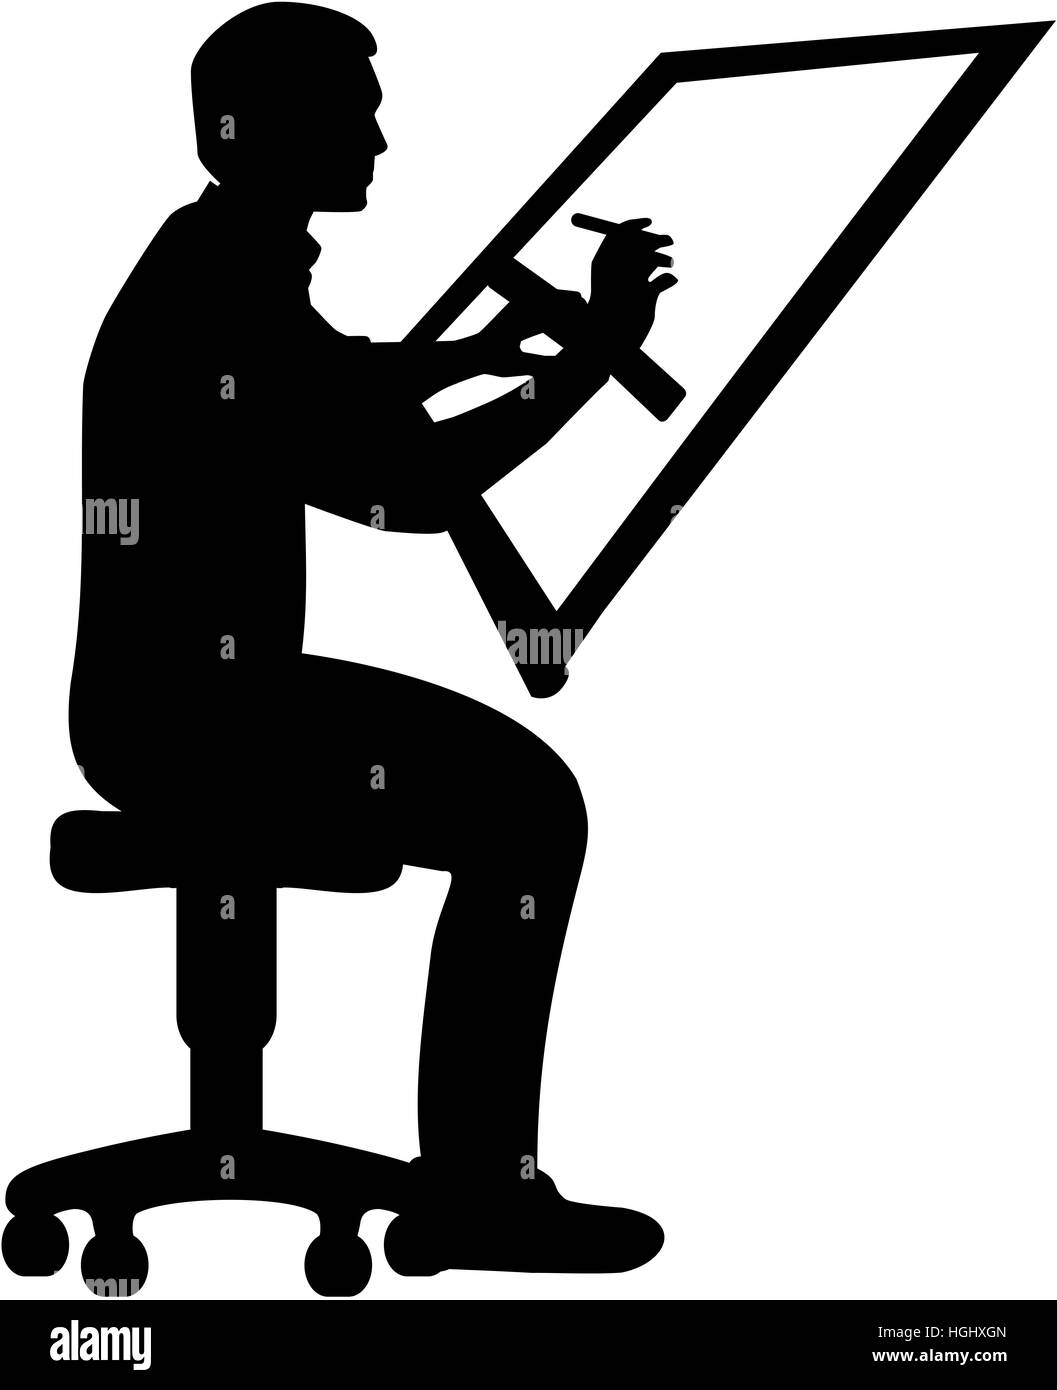 Verfasser. Mann am Zeichenbrett. Stockbild